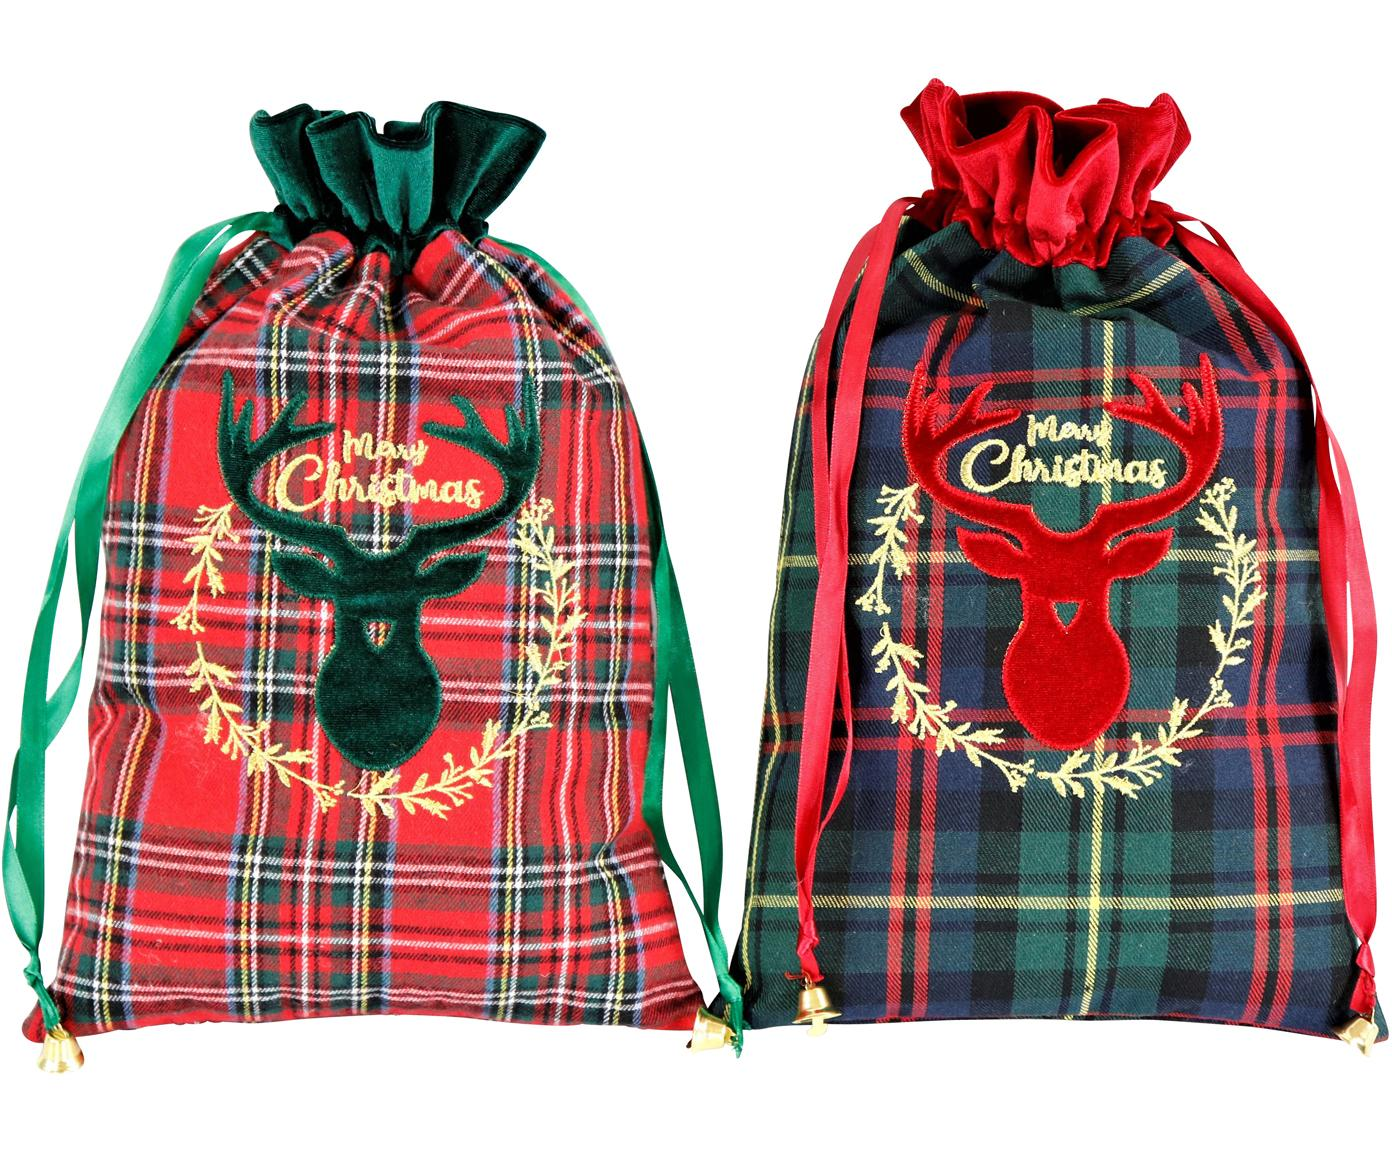 Set 2 oggetti decorativi Merry Christmas, Poliestere, cotone, Verde, rosso, nero, Larg. 22 x Lung. 35 cm